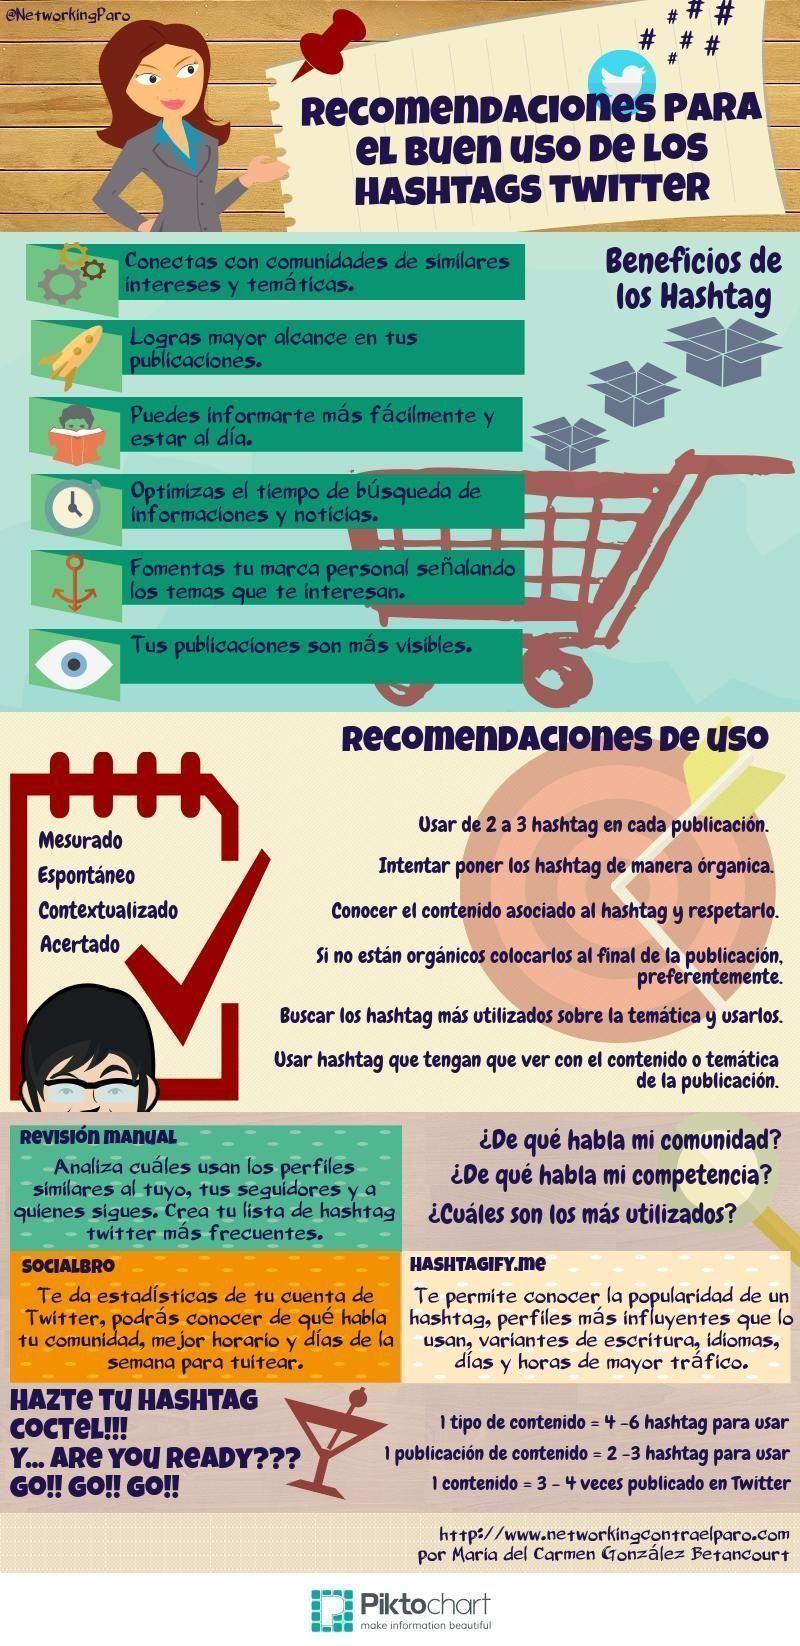 hashtag-twitter-beneficios-recomendaciones-uso